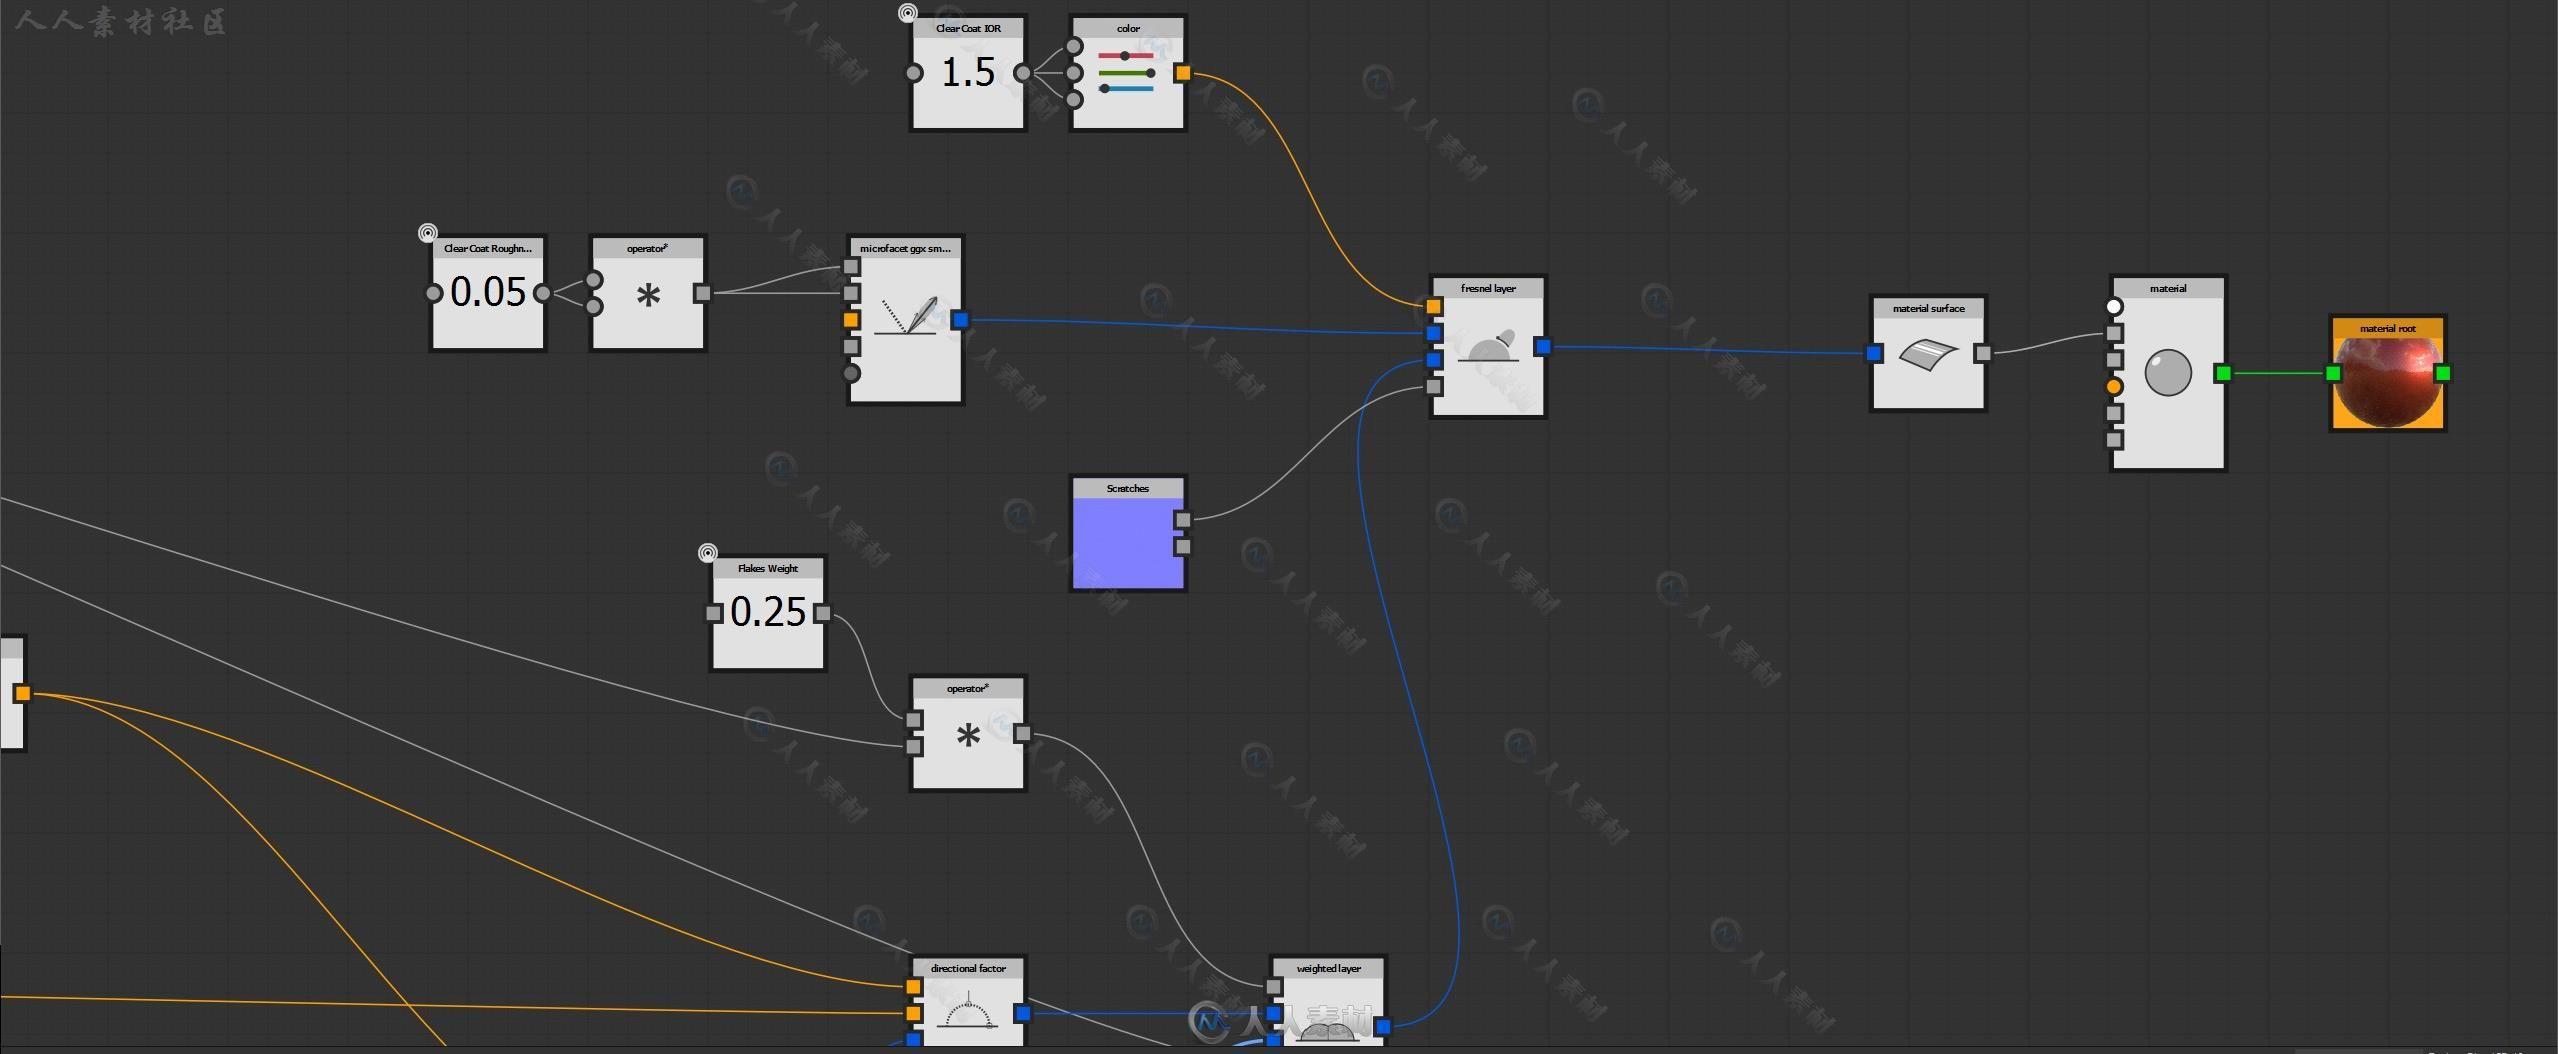 Substance Designer纹理材质制作软件V2018.3.0.1826版80 / 作者:抱着猫的老鼠 / 帖子ID:16752041,5313483